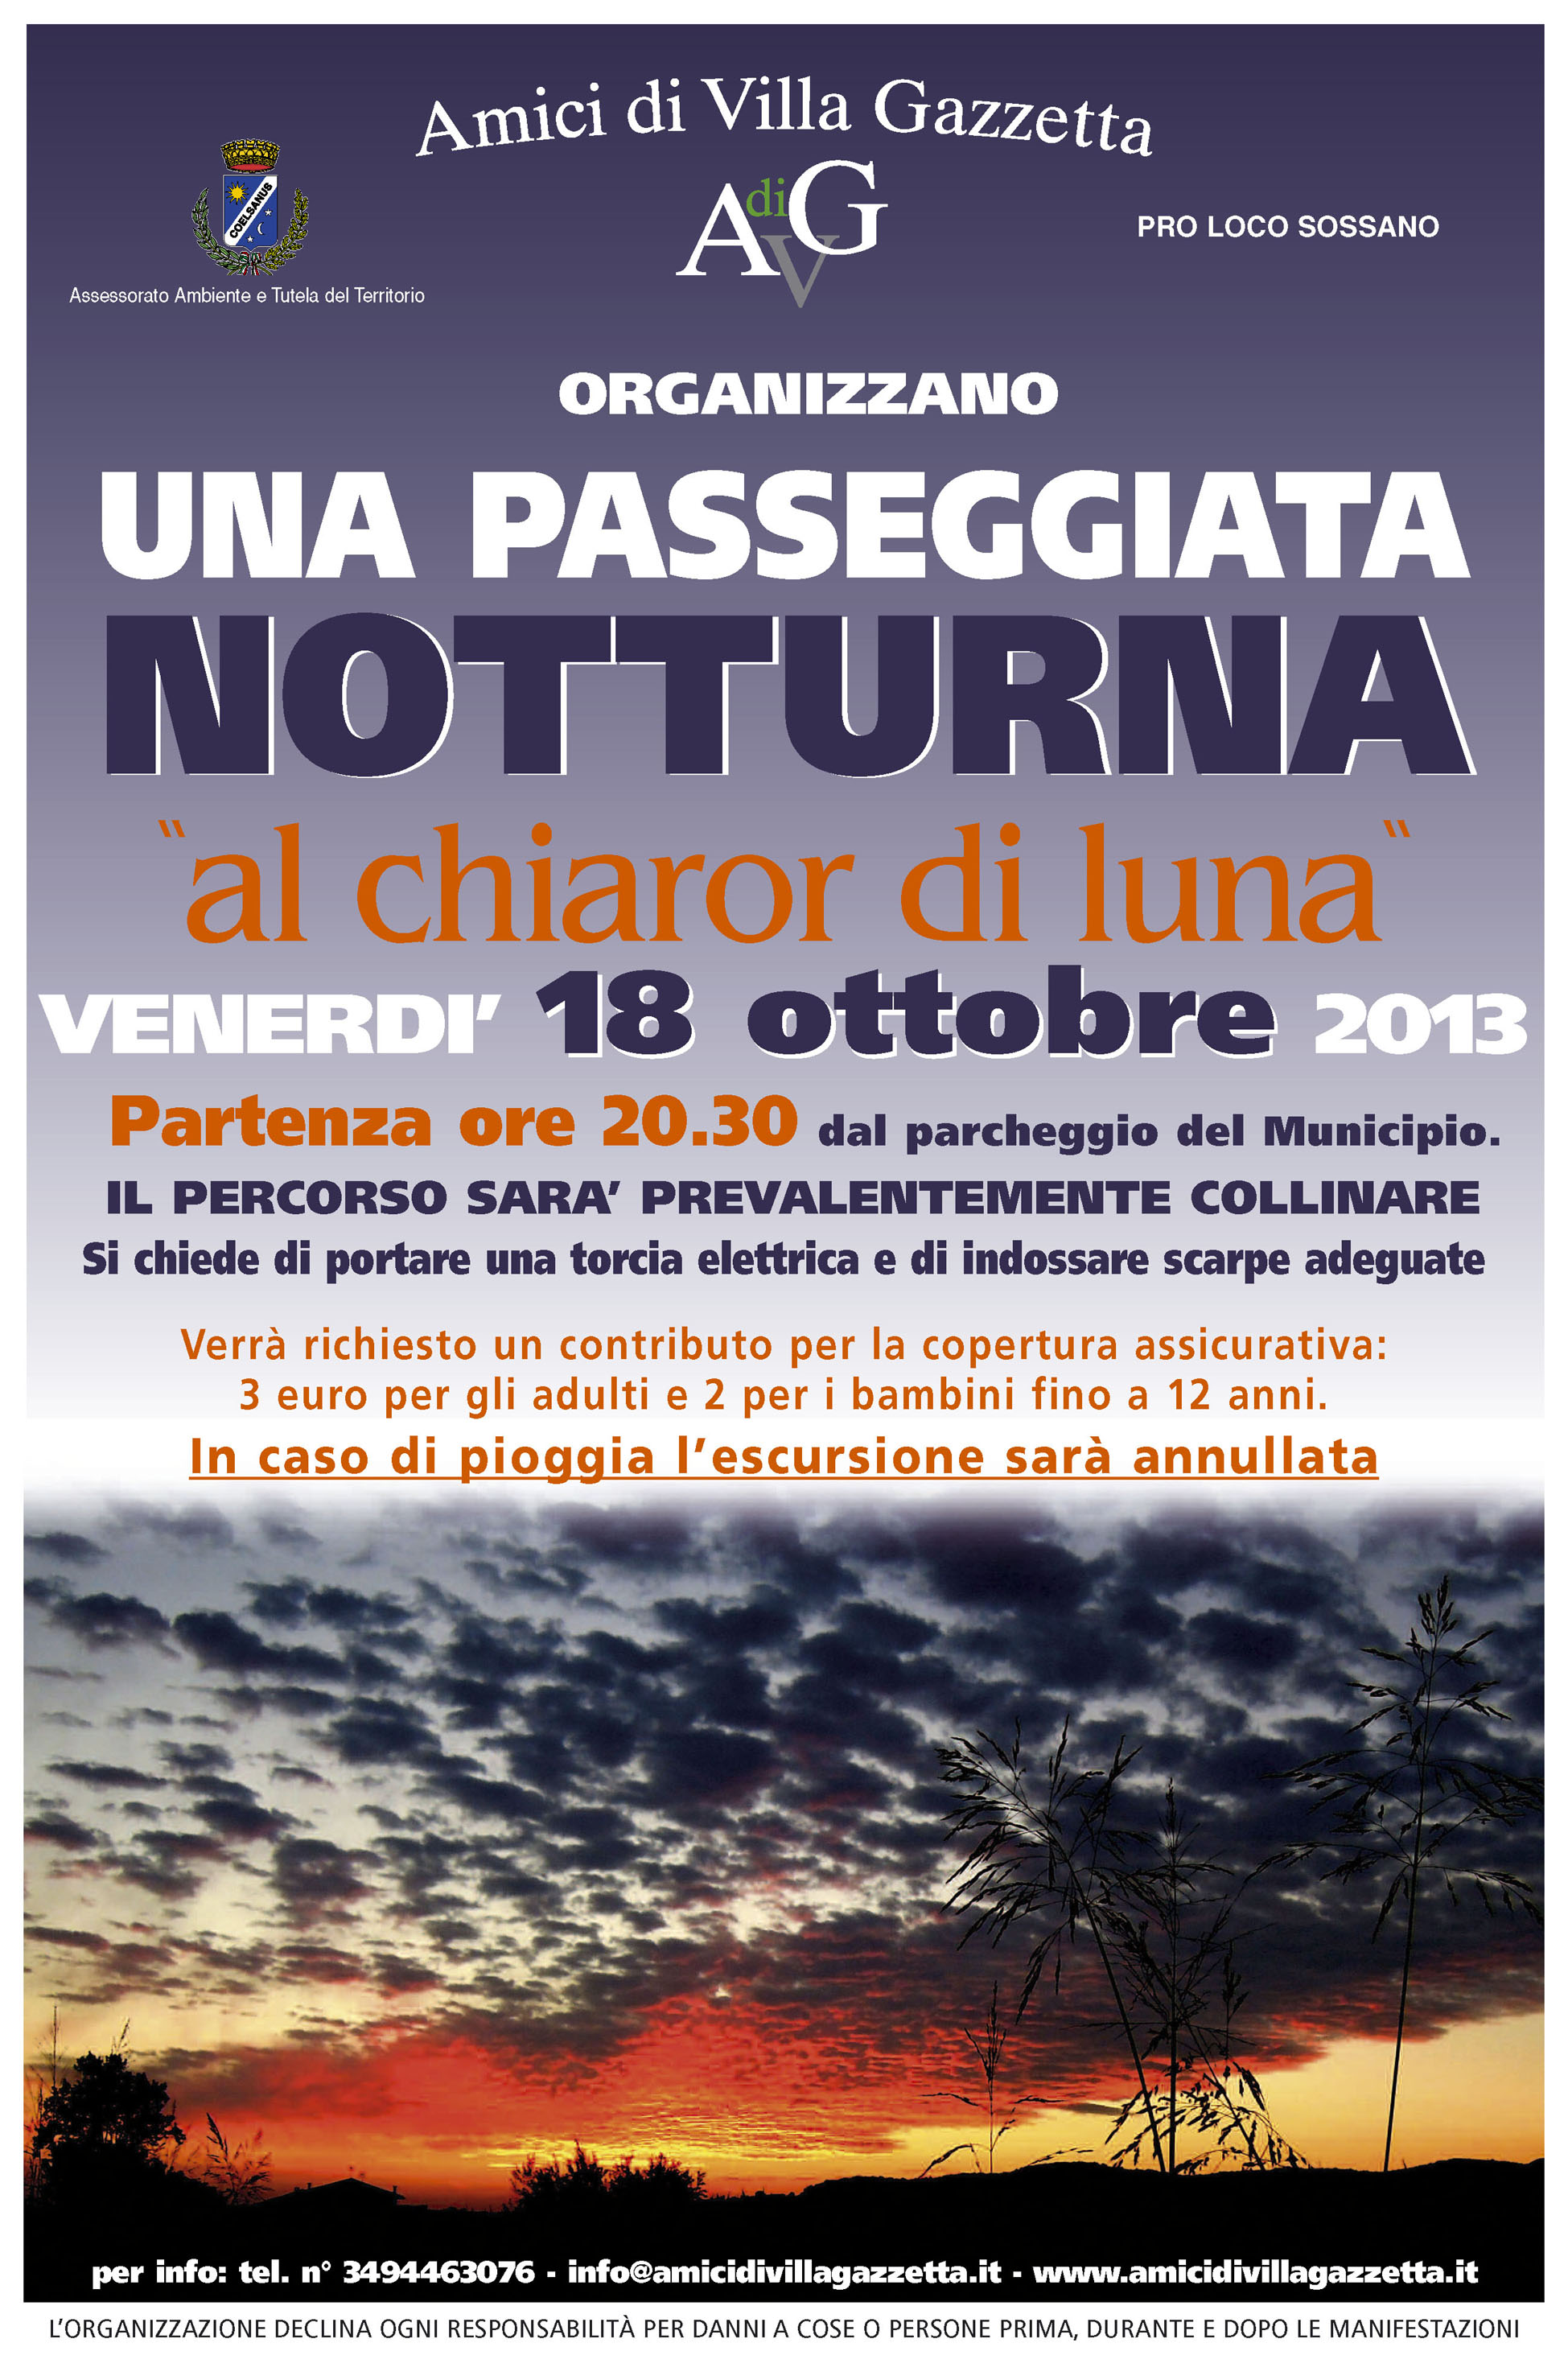 Locandina Notturna 18 ottobre